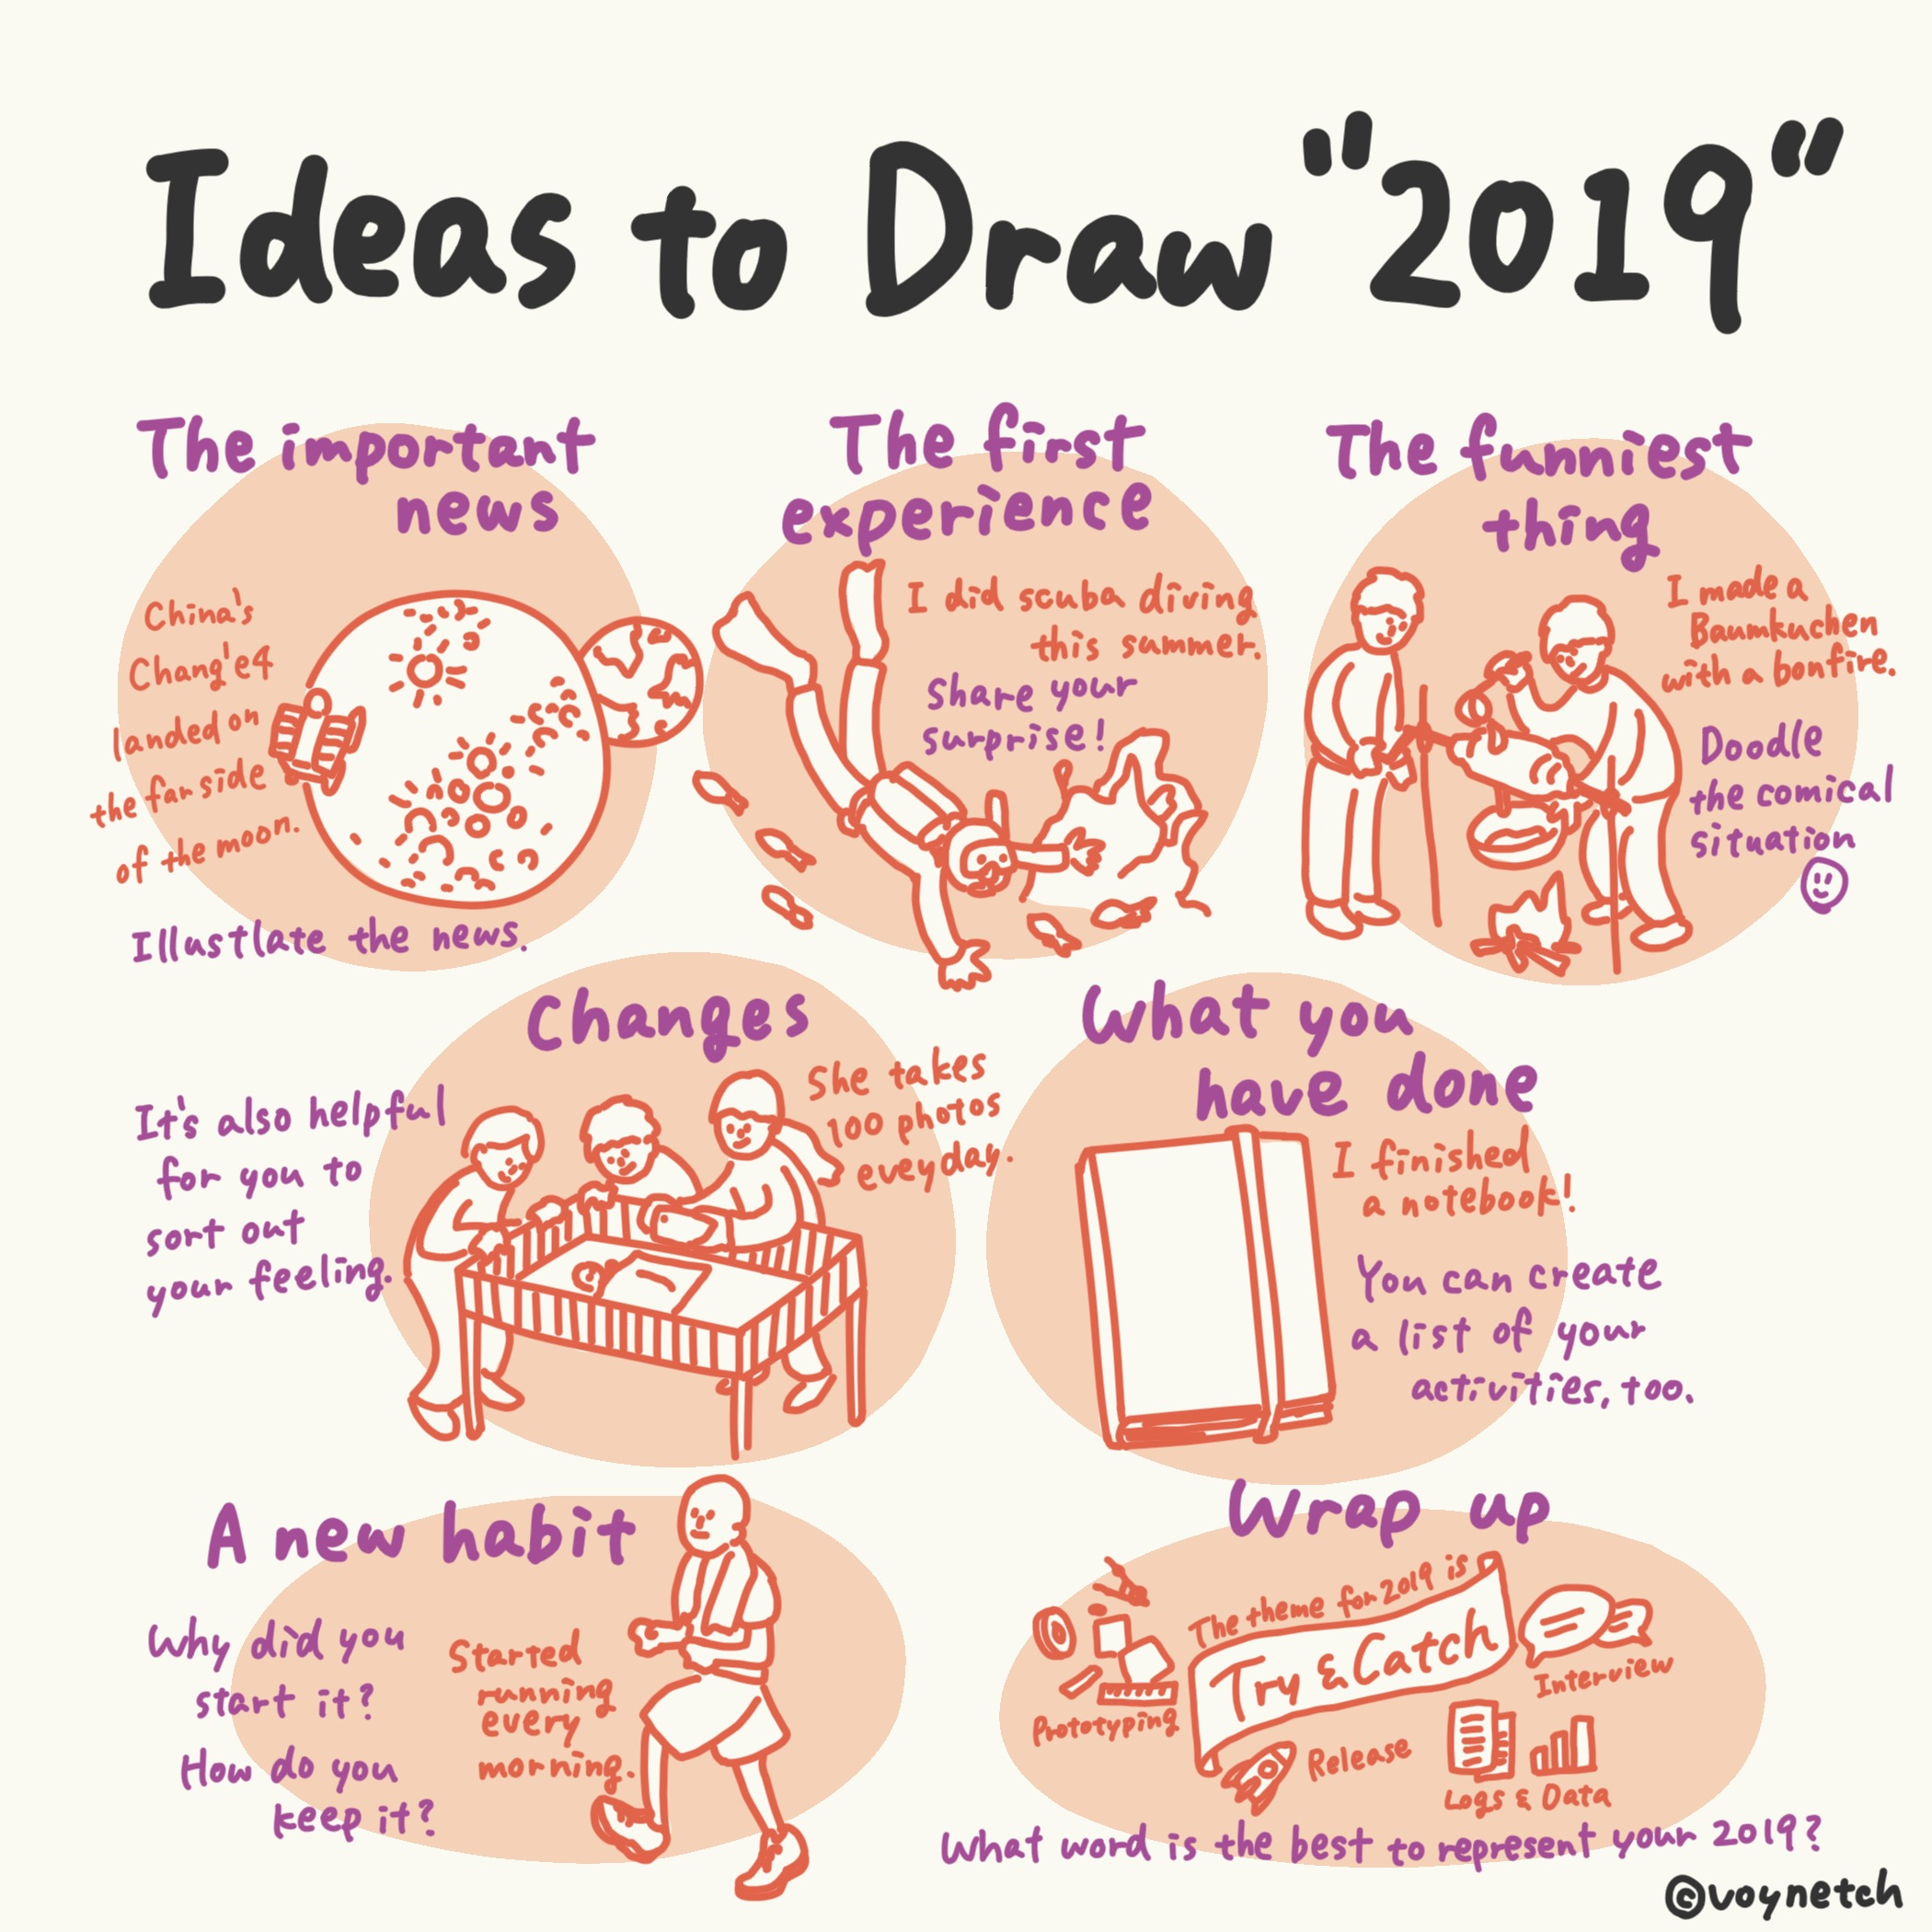 "Ideas to Draw ""2019"" Image"